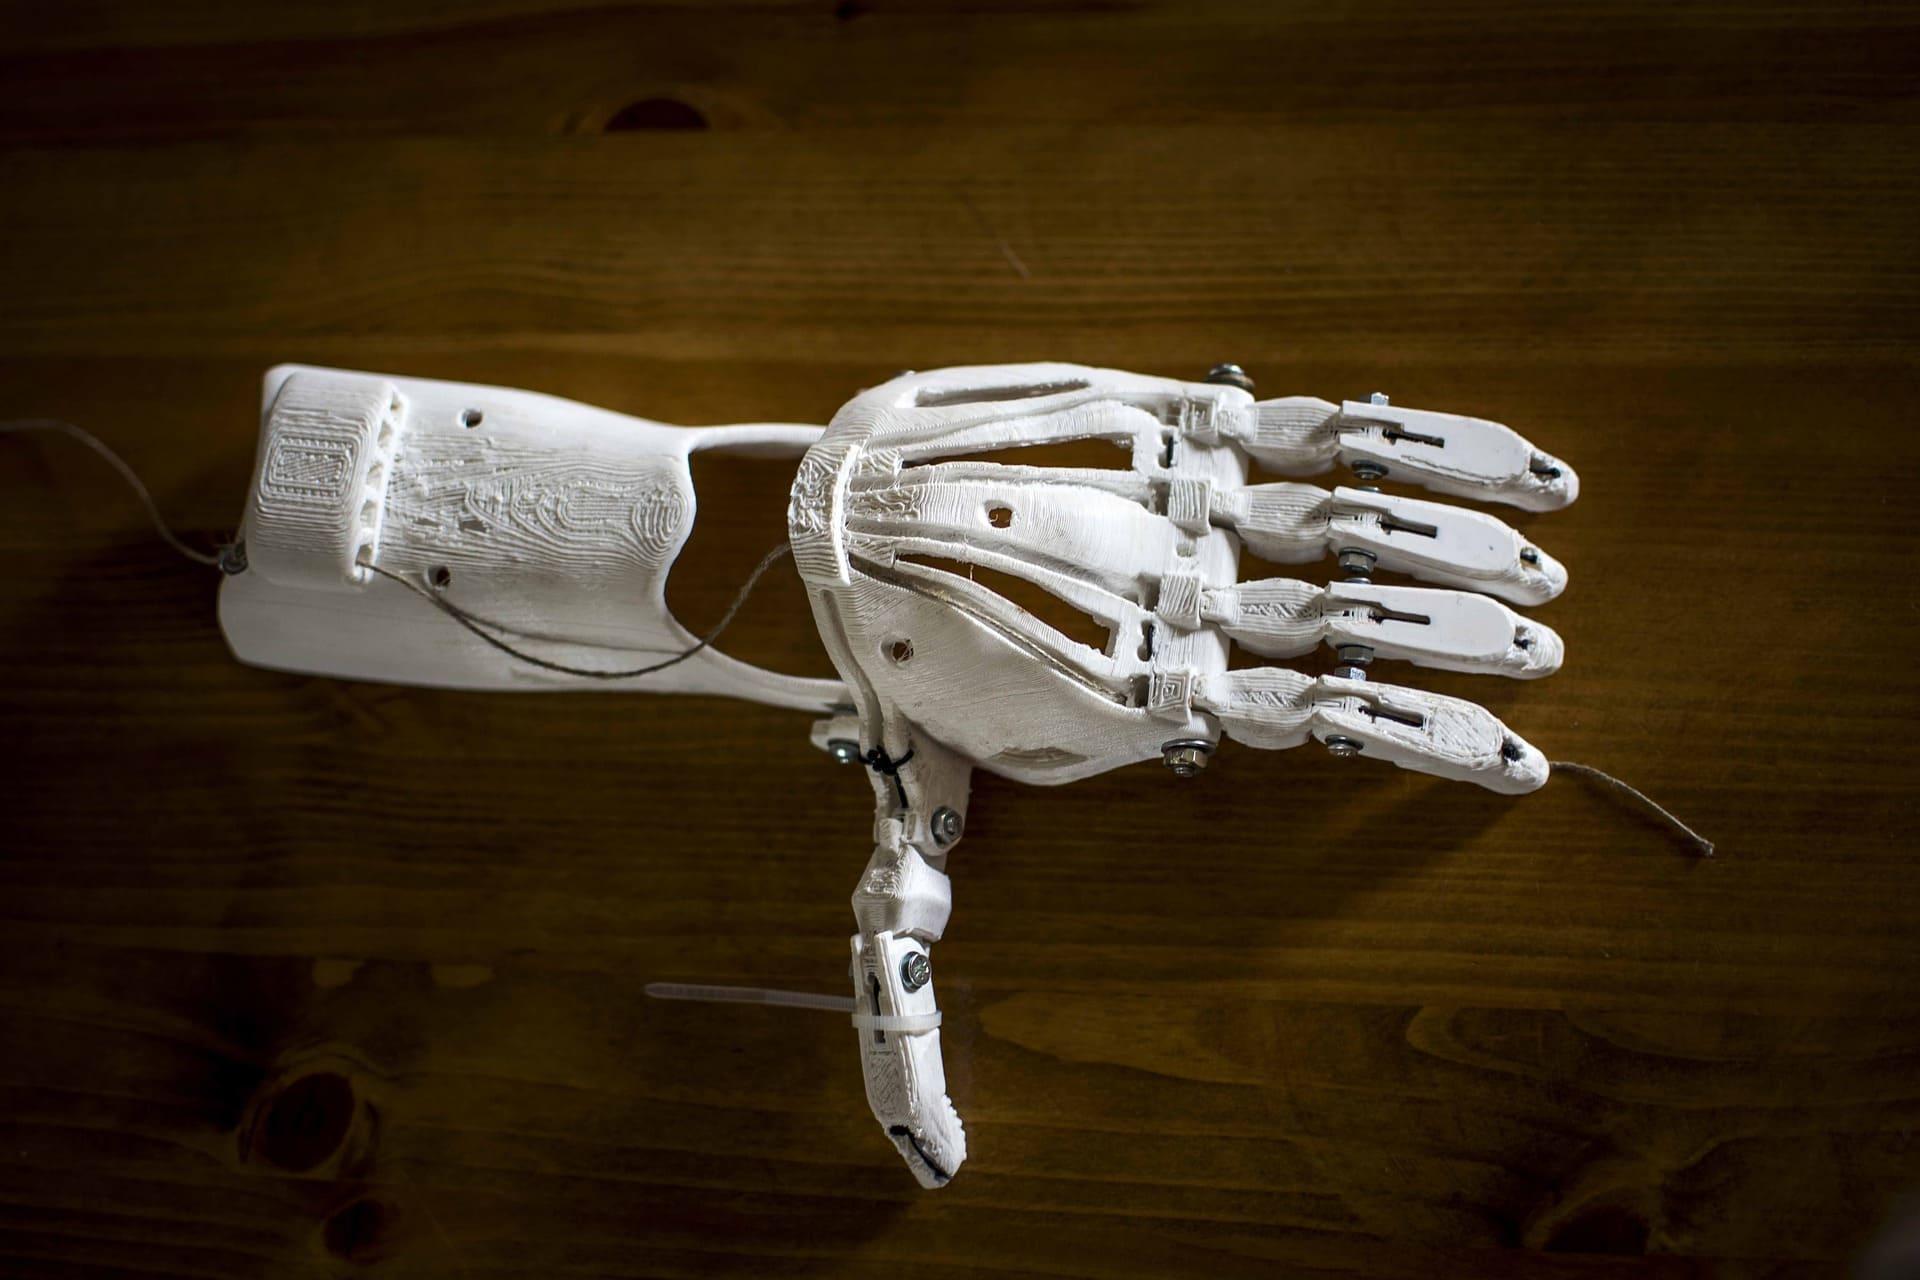 Die wachsende 3D Drucker Industrie